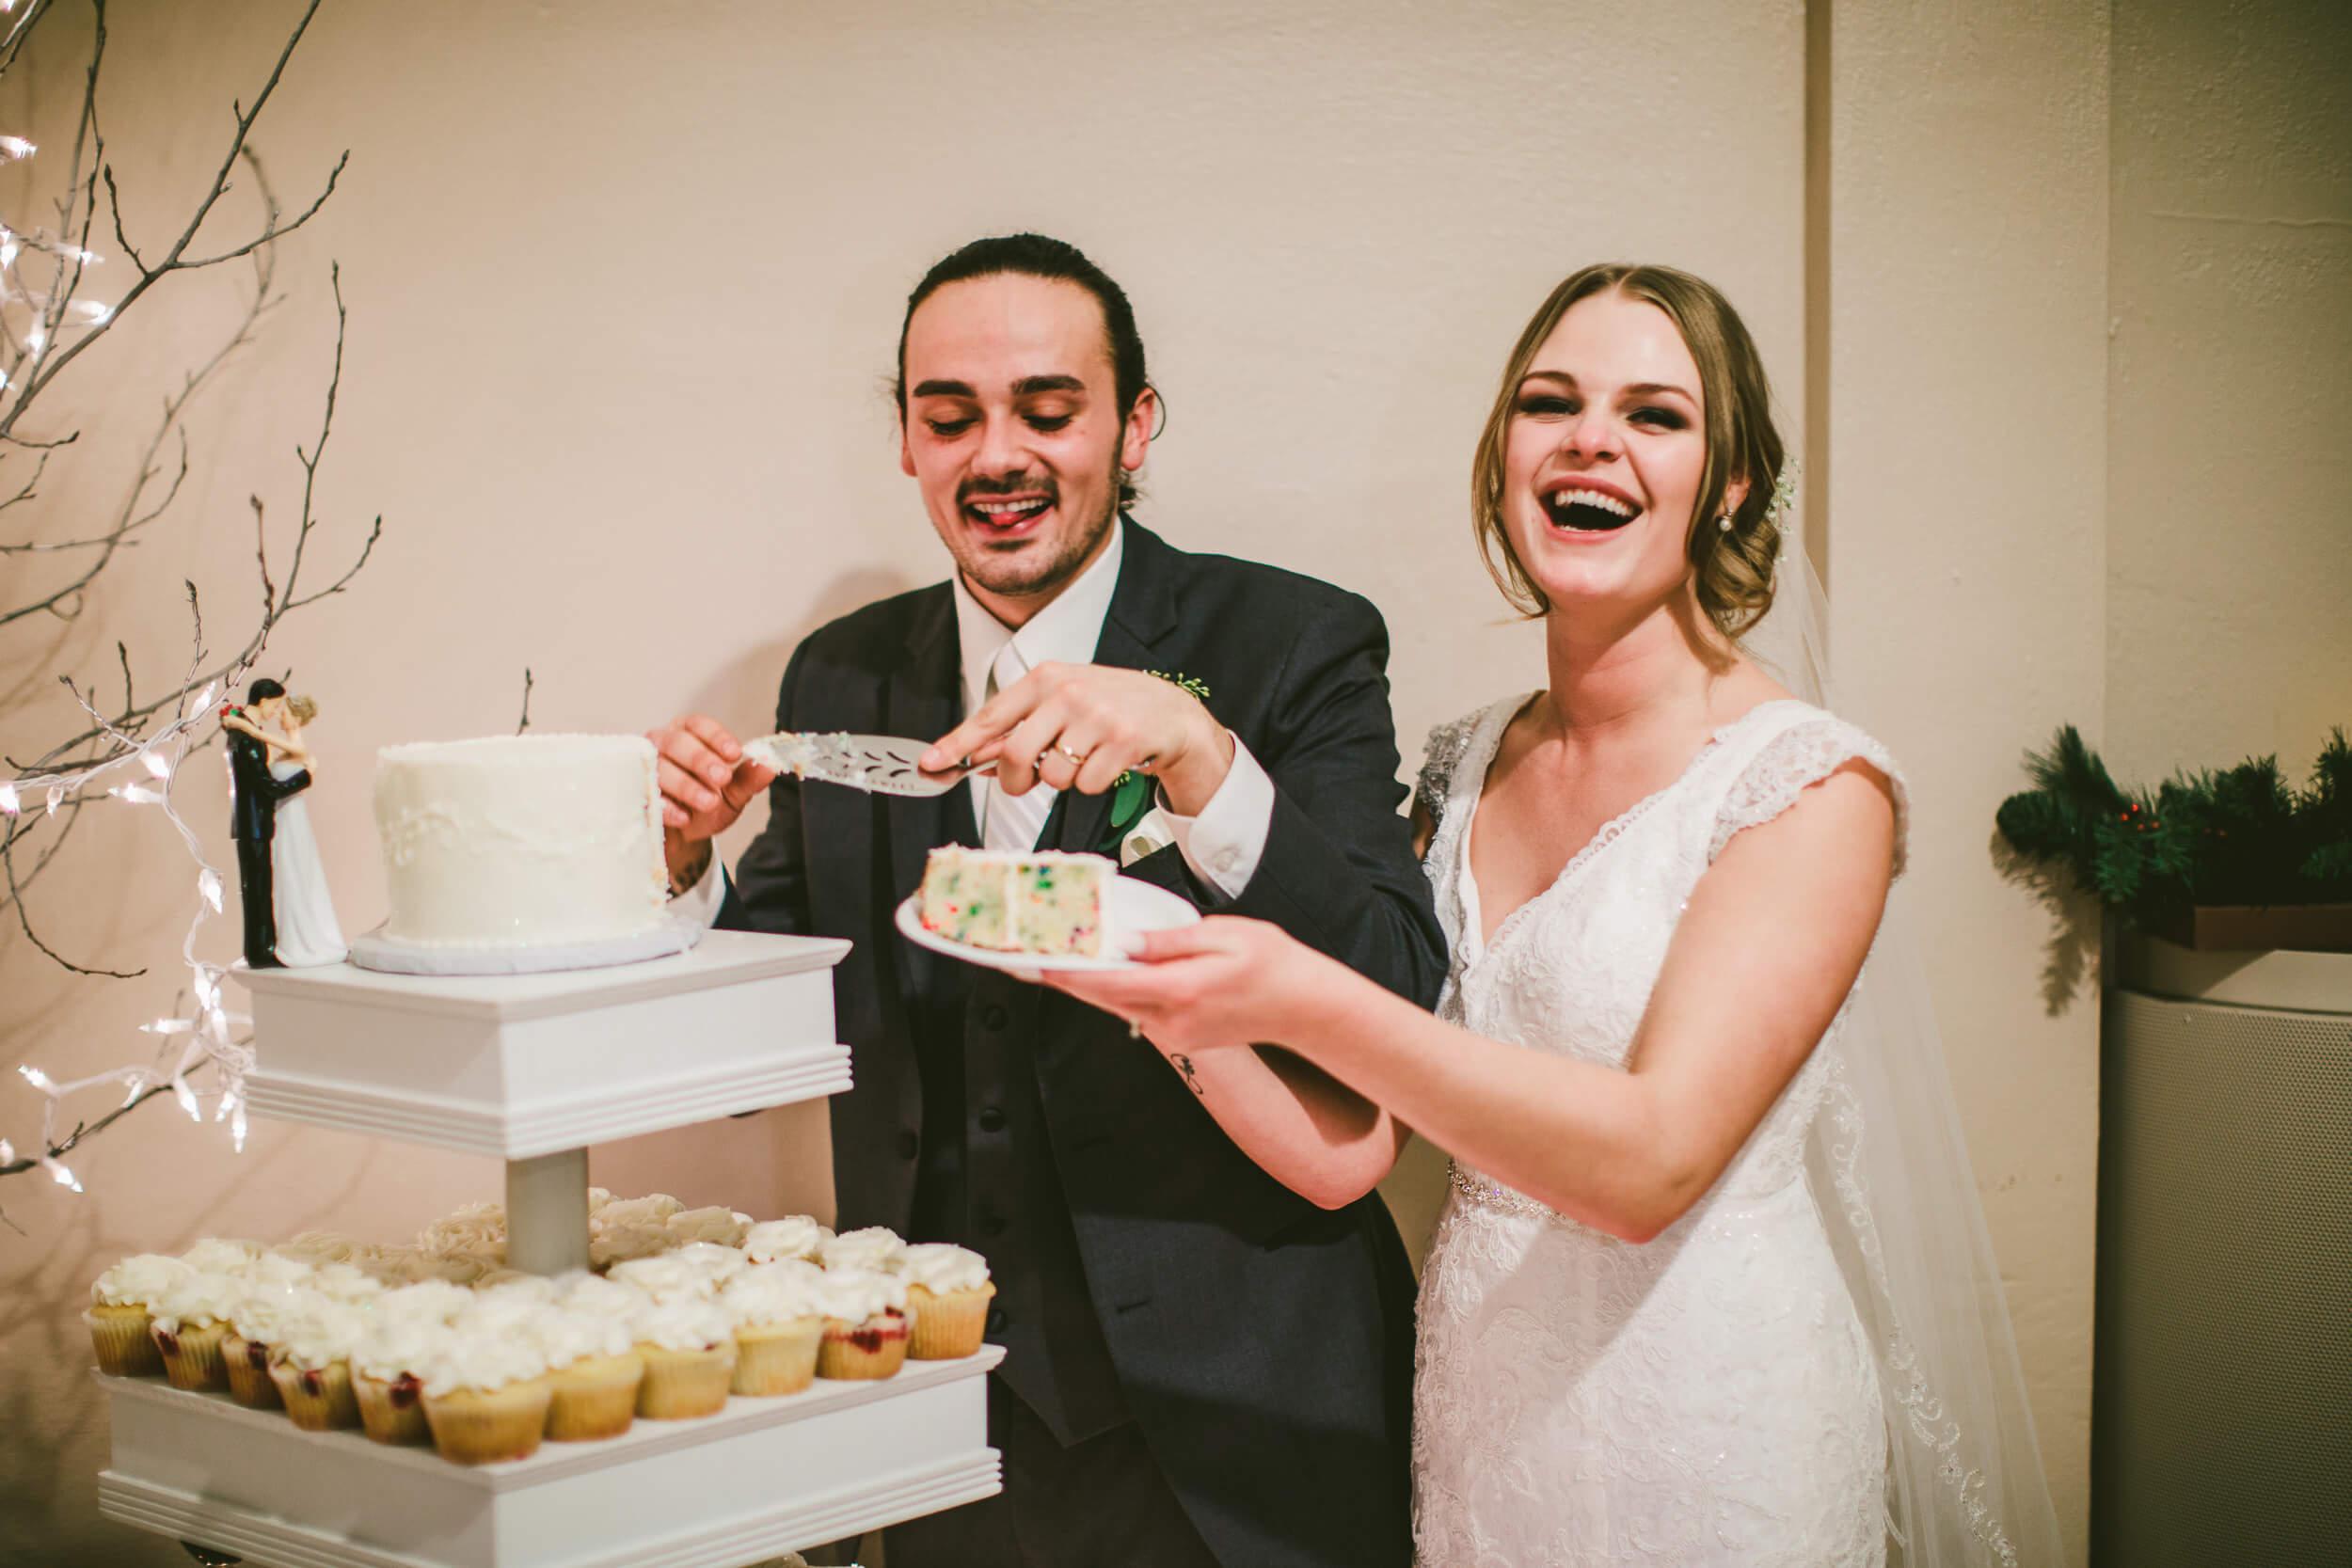 mukogawa winter wedding in spokane (312).jpg